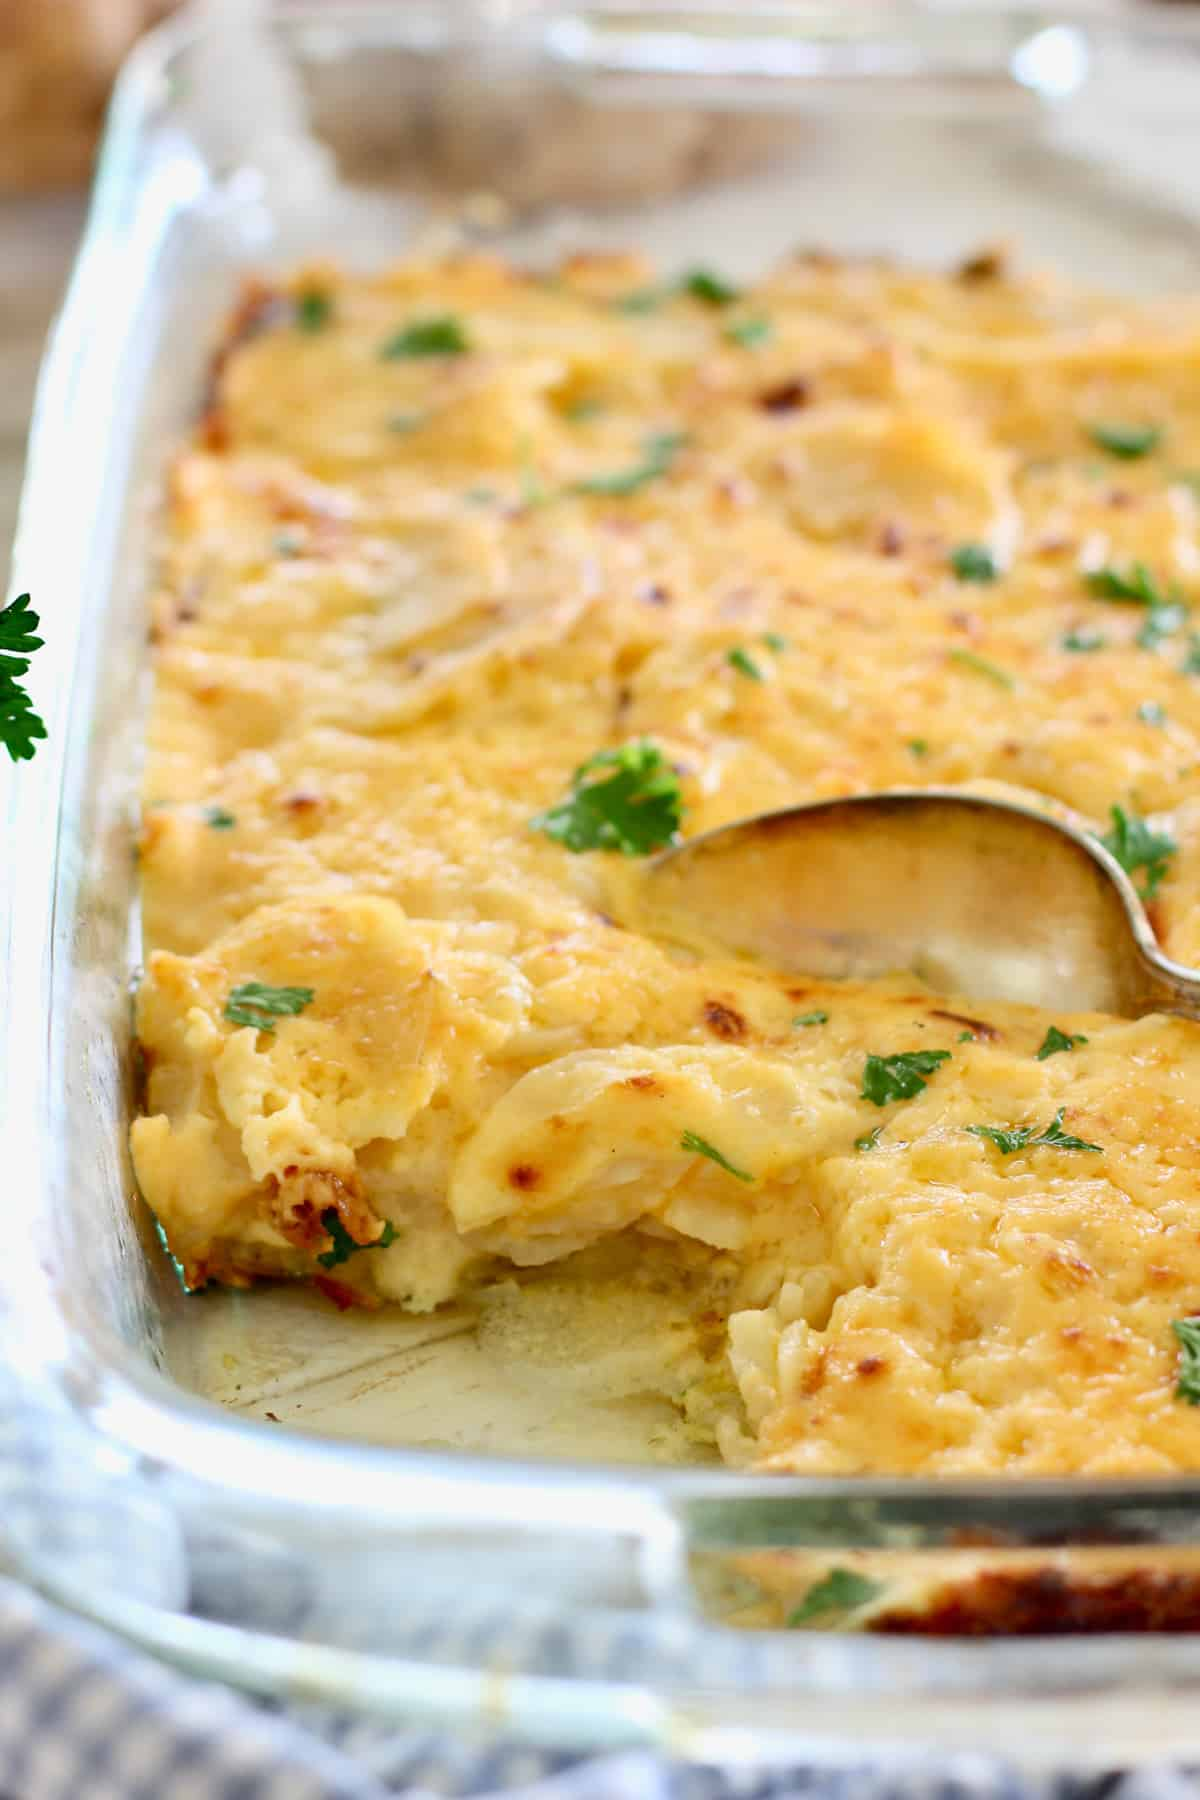 Cheesy Scalloped Potatoes in a 9 x 13 baking dish